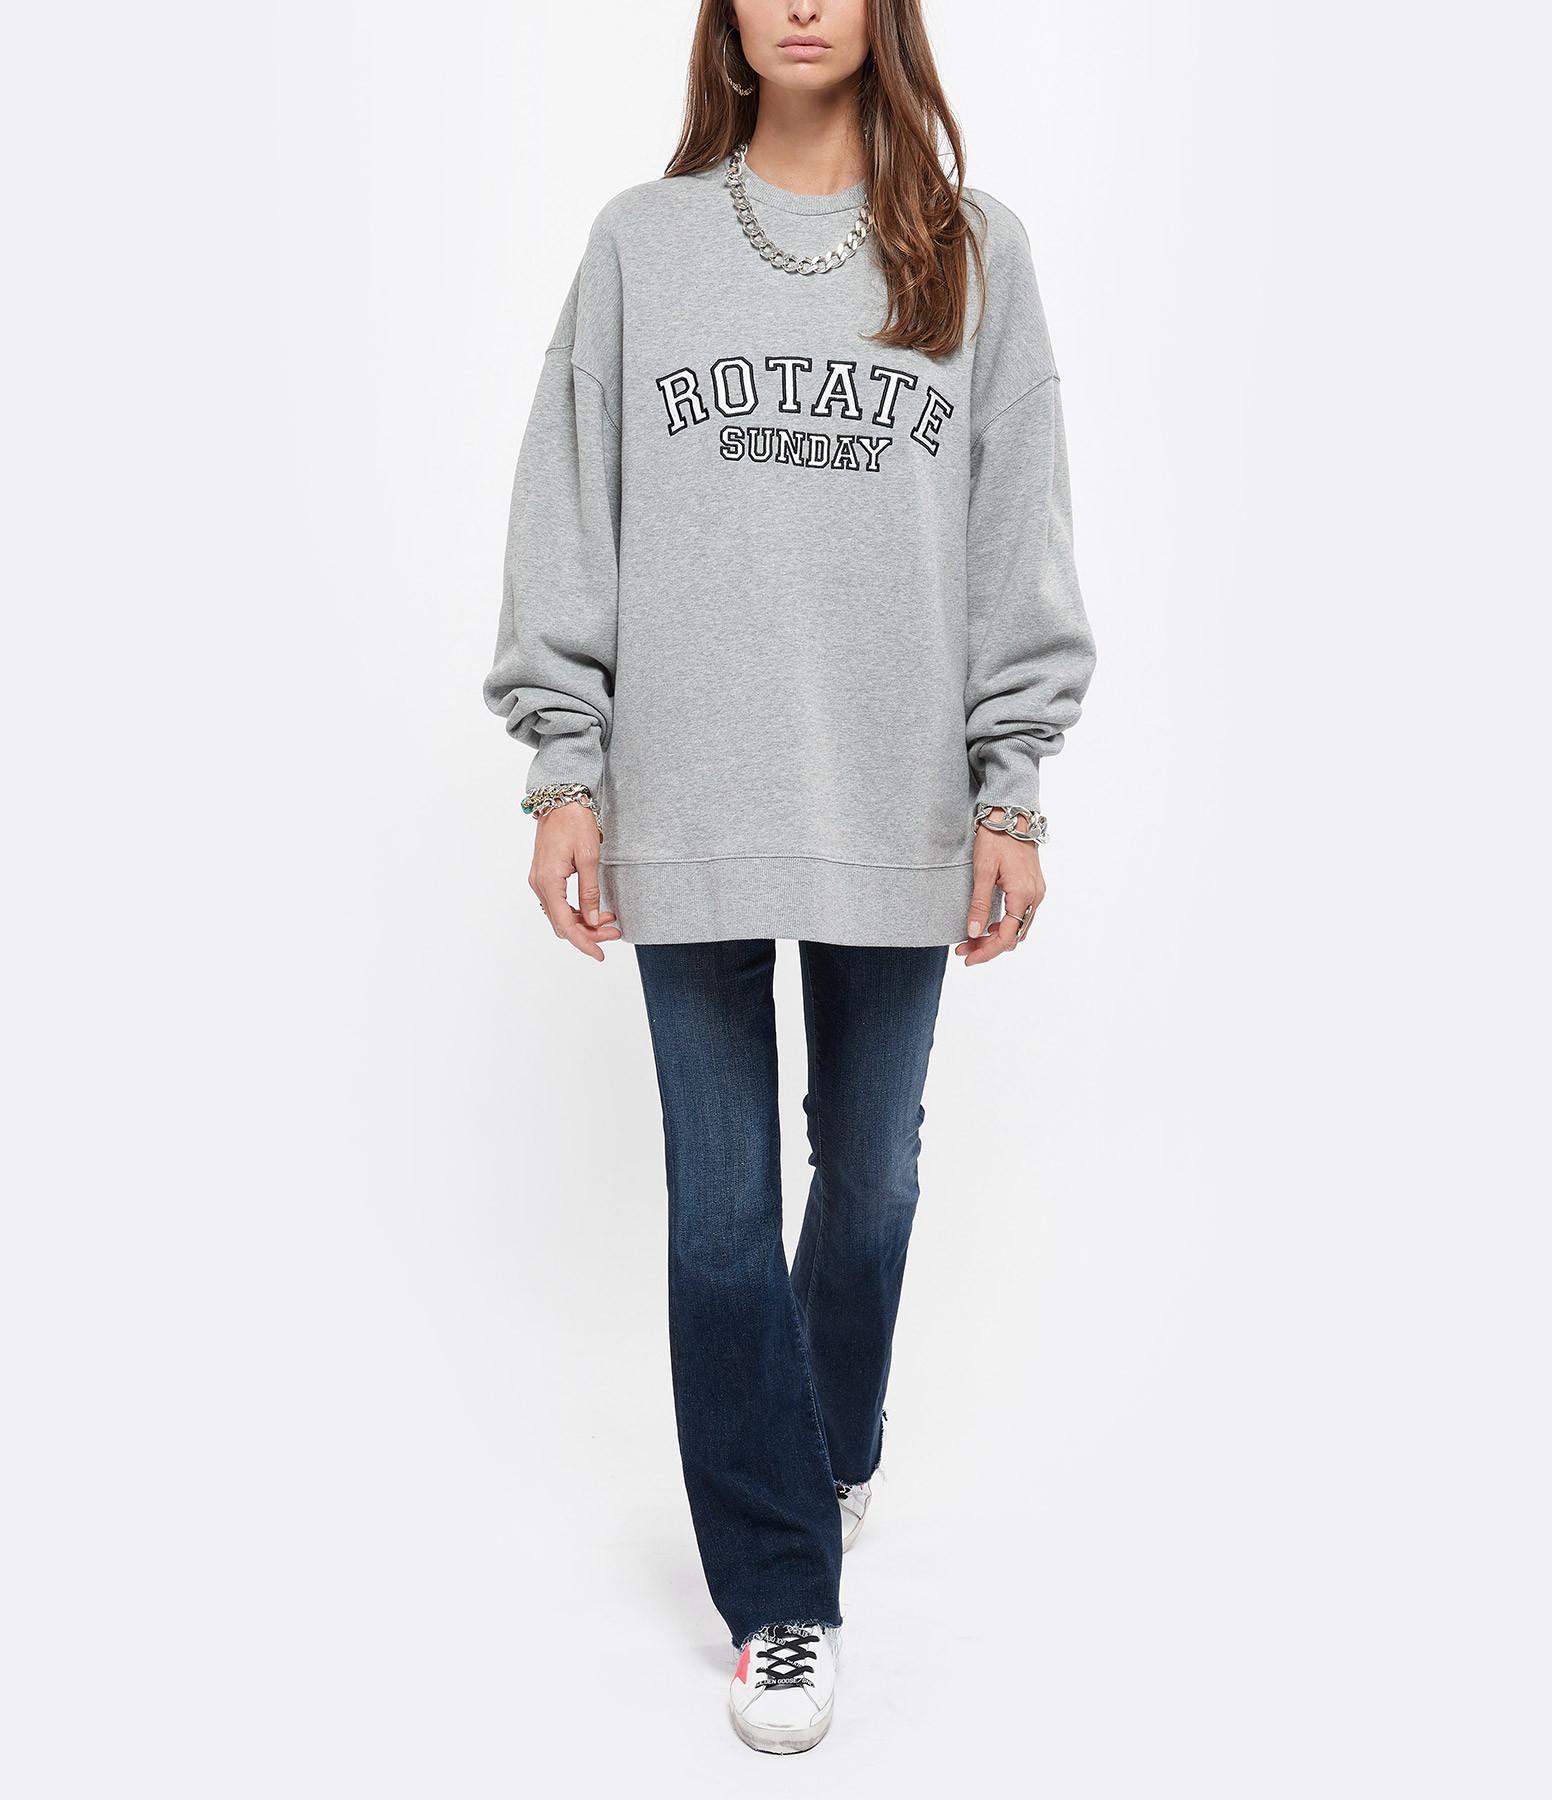 ROTATE - Sweatshirt Iris Coton Biologique Gris, Capsule Sun